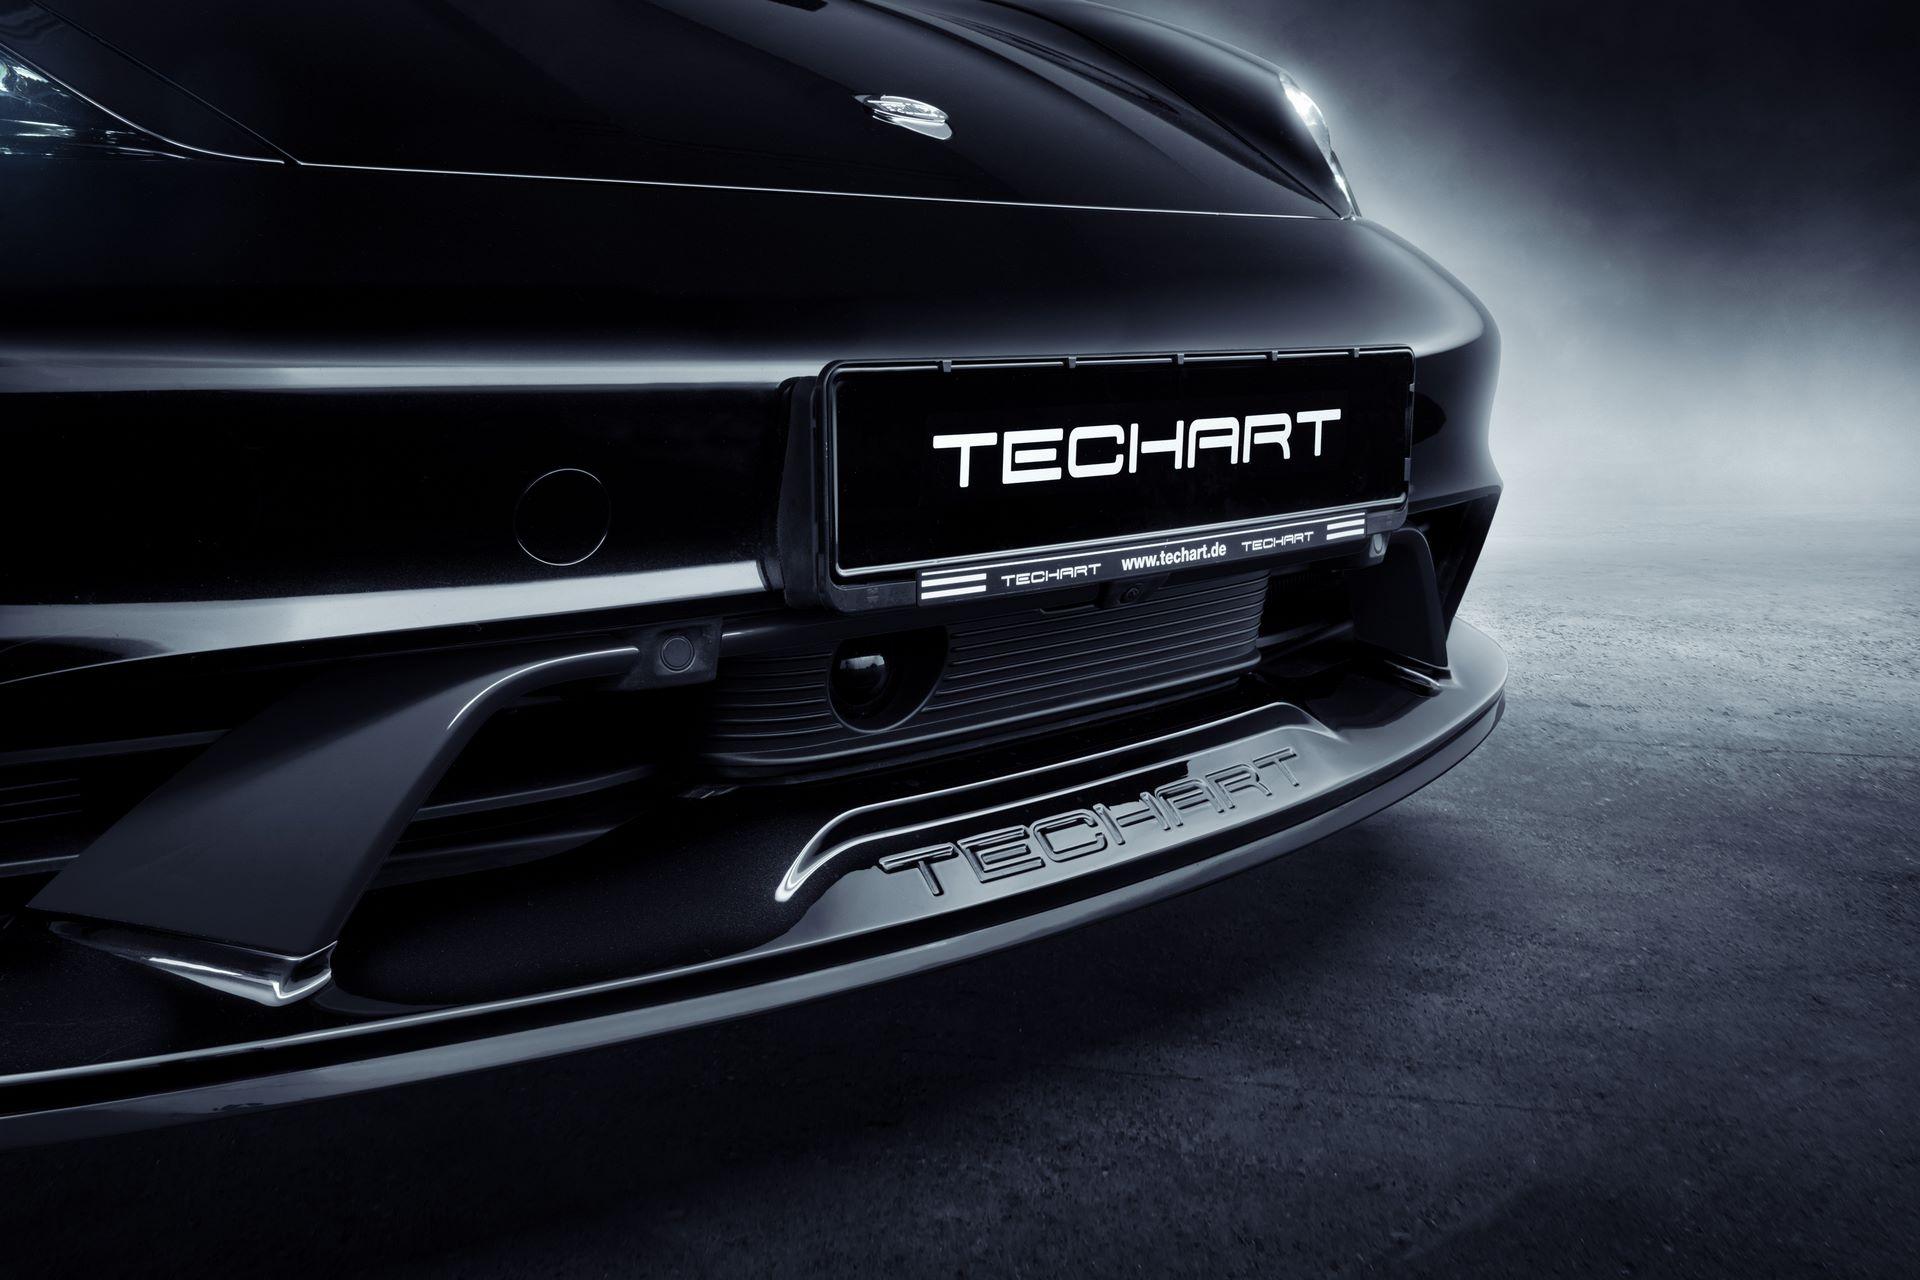 Porsche-Taycan-bodykit-by-TechArt-20